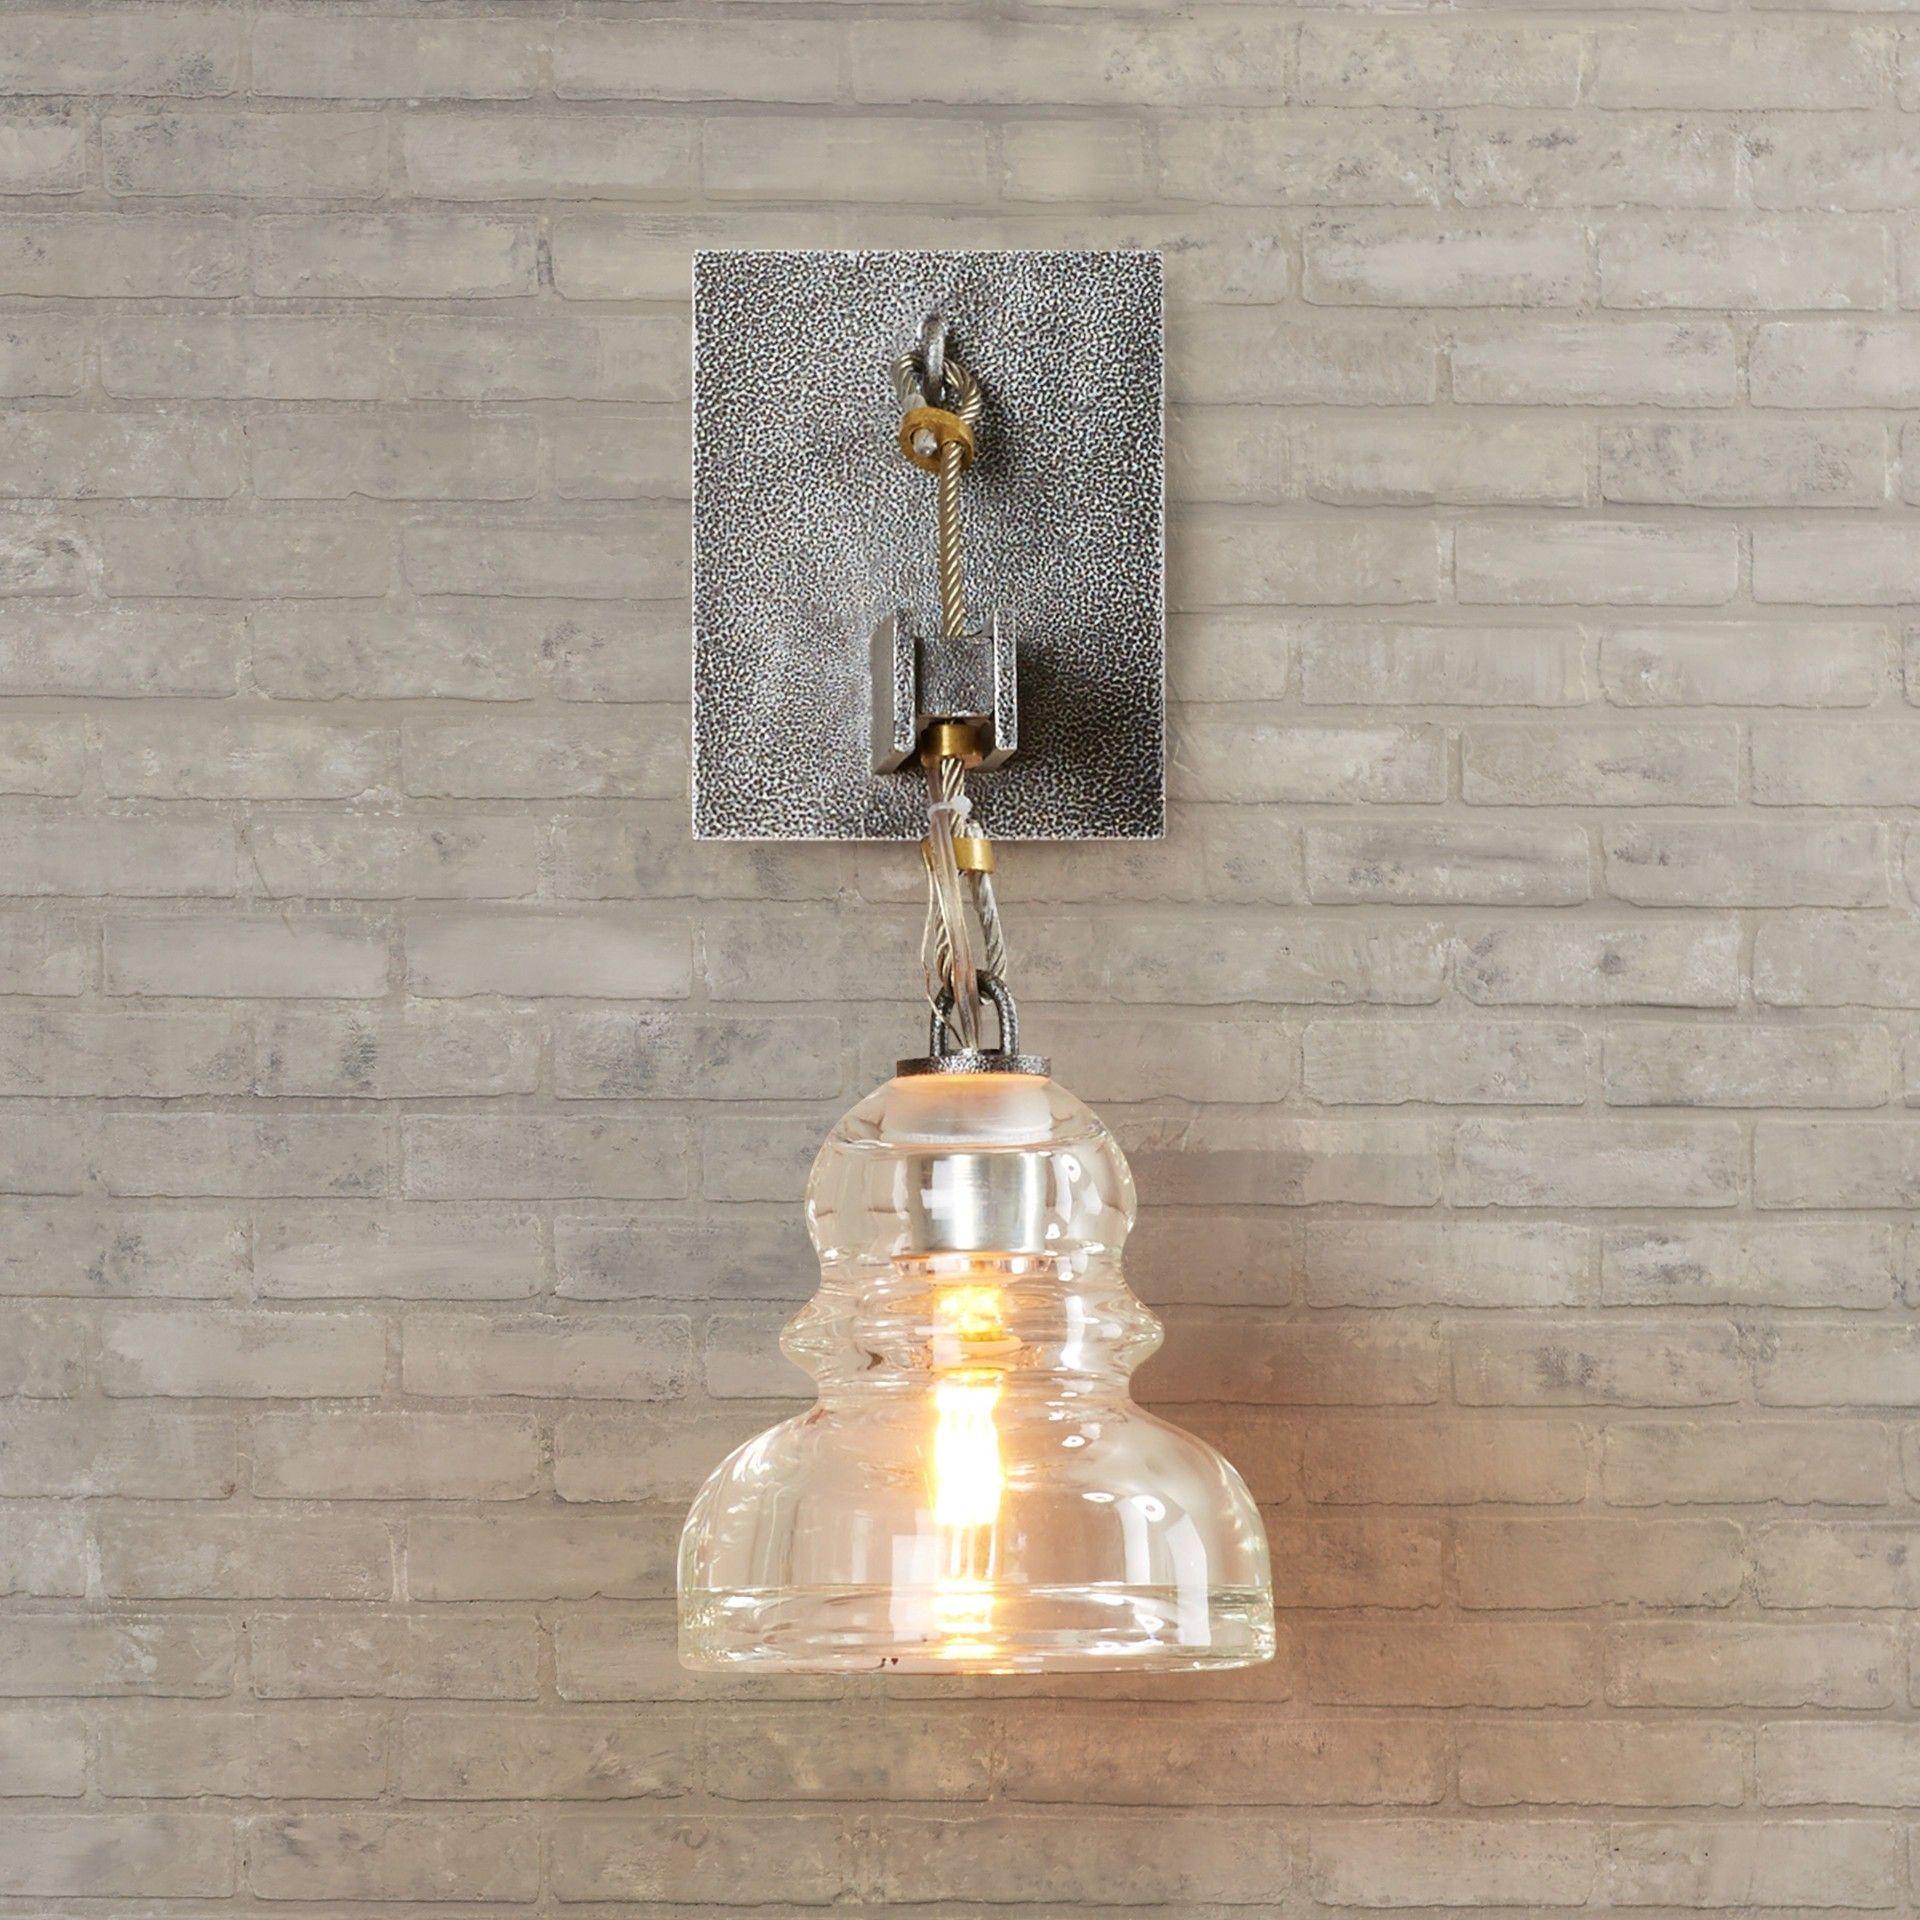 Astounding Useful Ideas Wall Sconces Gold Light Fixtures wall